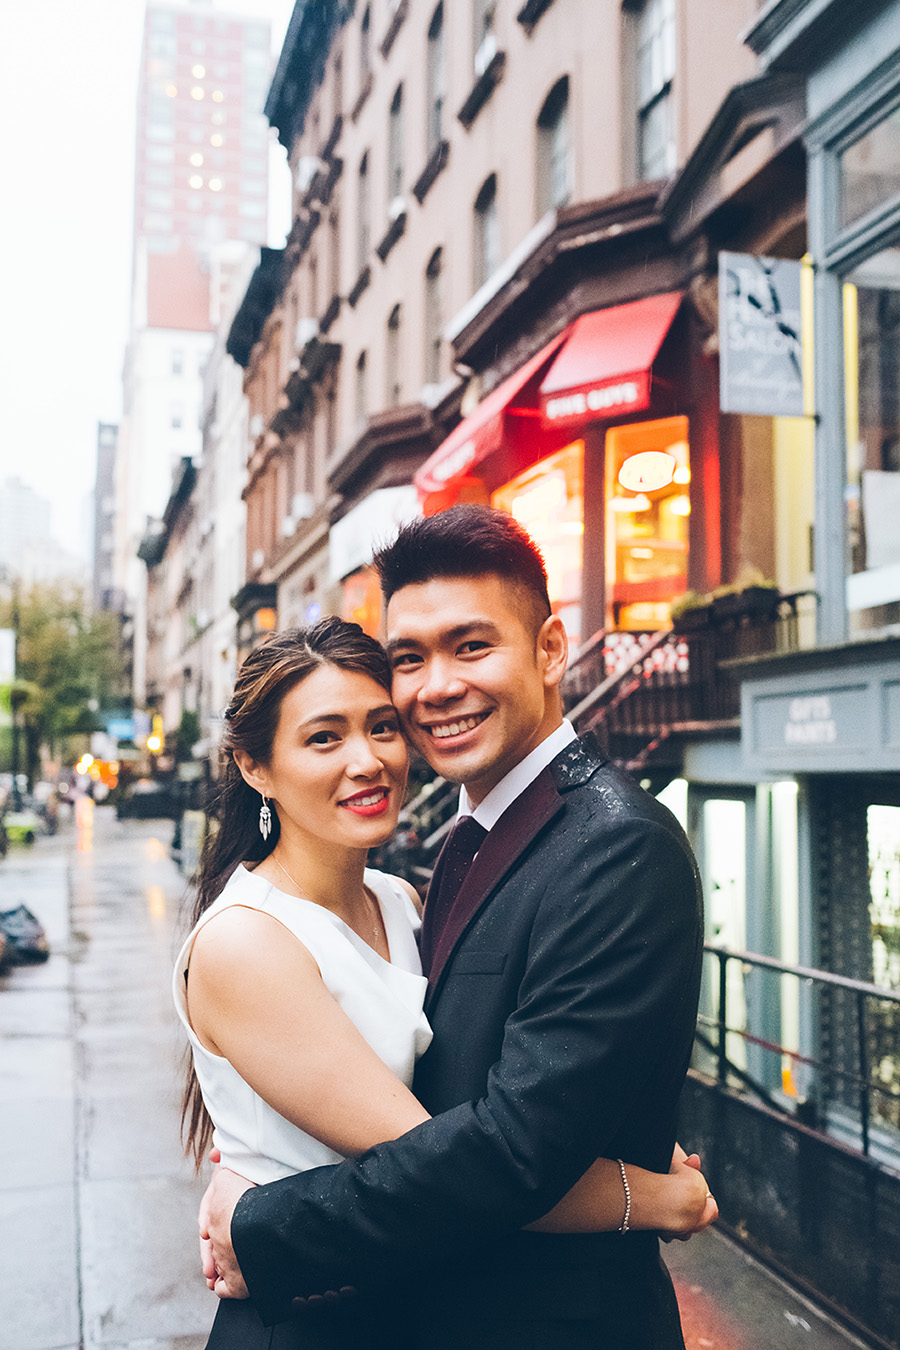 NEW-YORK-CITY-WEDDING-PHOTOGRAPHER-INTIMATE-WEDDING-ELOPEMENT-BROOKLYN-PROMENADE-CITYHALL-MANHATTAN-BROOKLYN-WEDDING-PHOTOGRAPHY-JackieAaron-0056.jpg